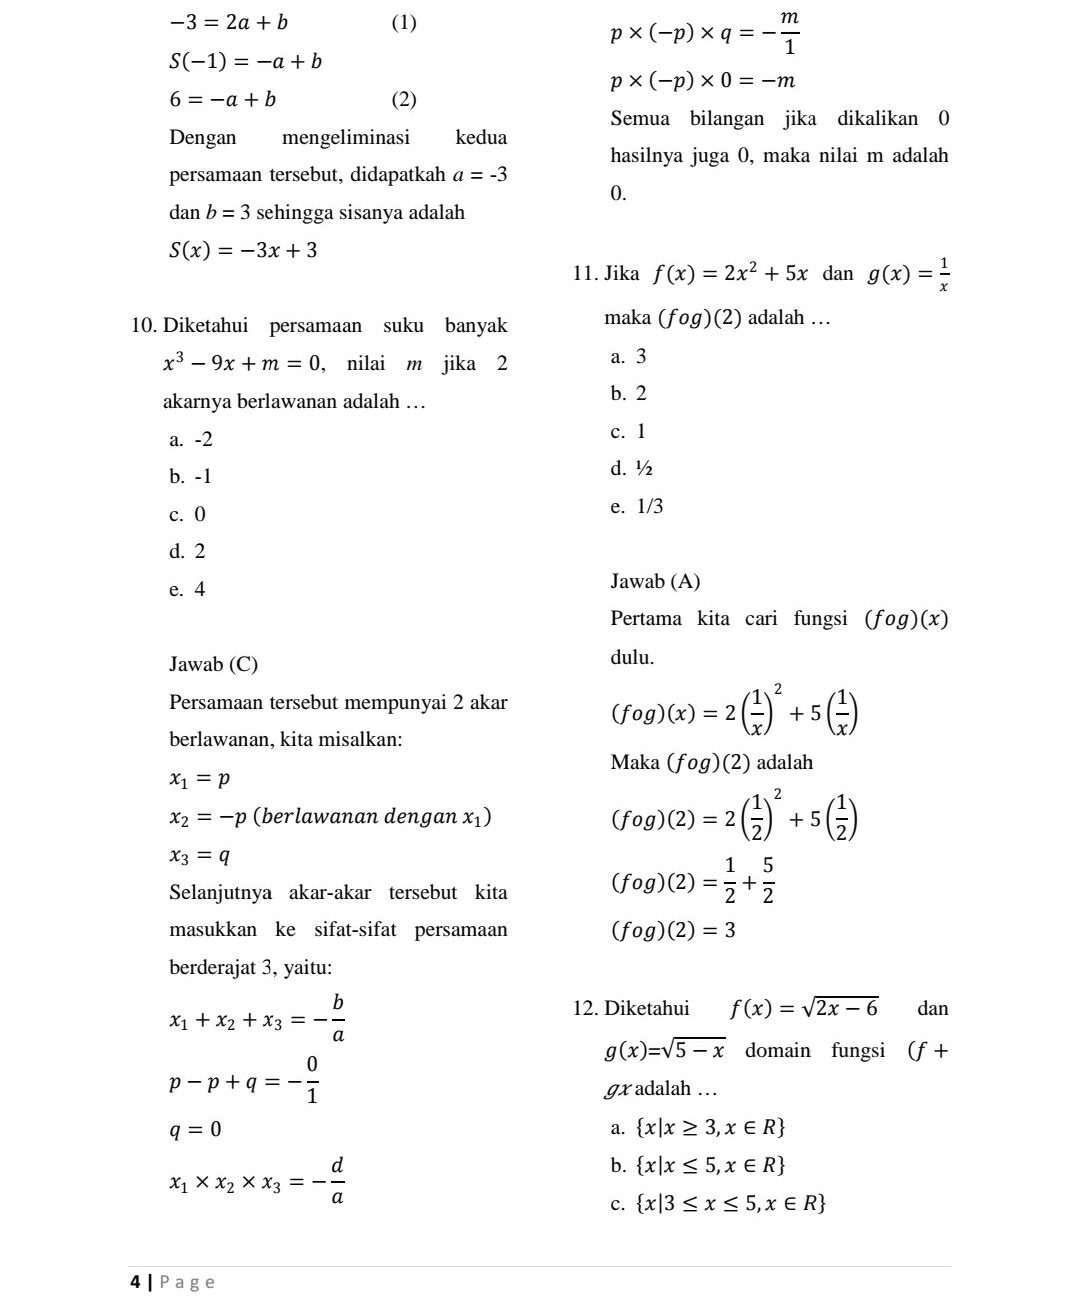 Soal Matematika Kelas 11 Semester 2 Dan Jawabannya : matematika, kelas, semester, jawabannya, Pembahasan, Matematika, Kelas, Semester, Dicky